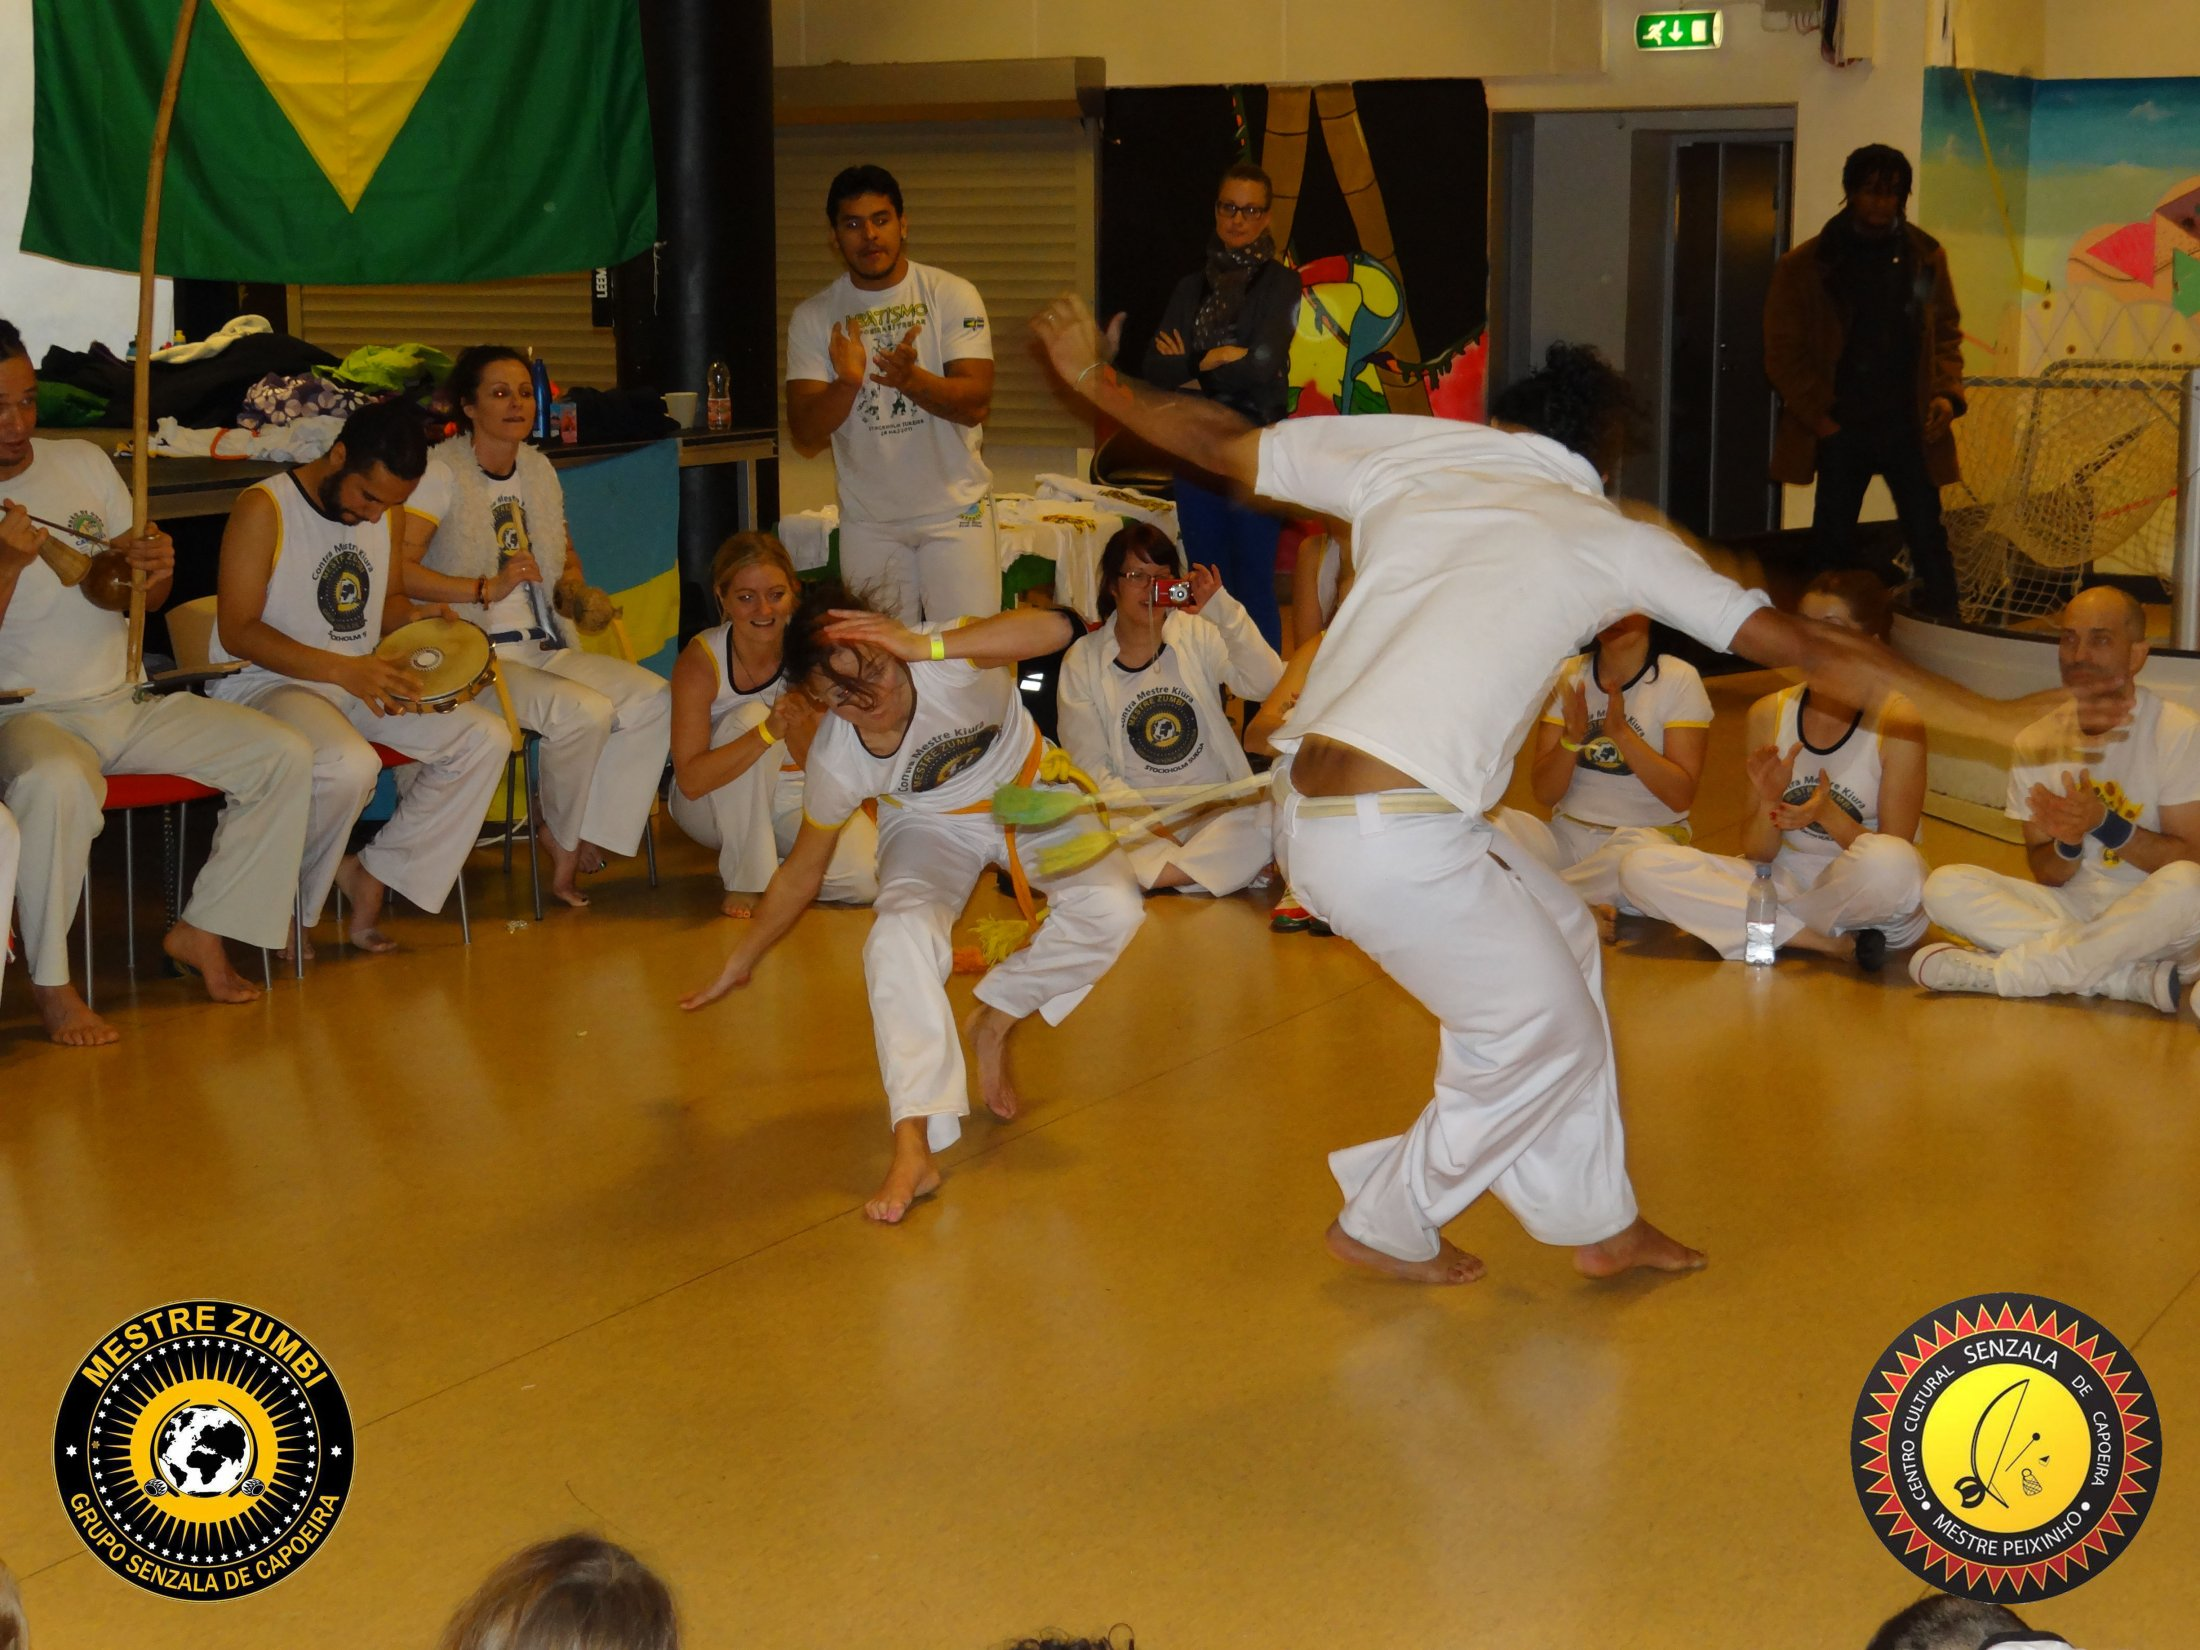 2013-12-14 - Capoeira 103